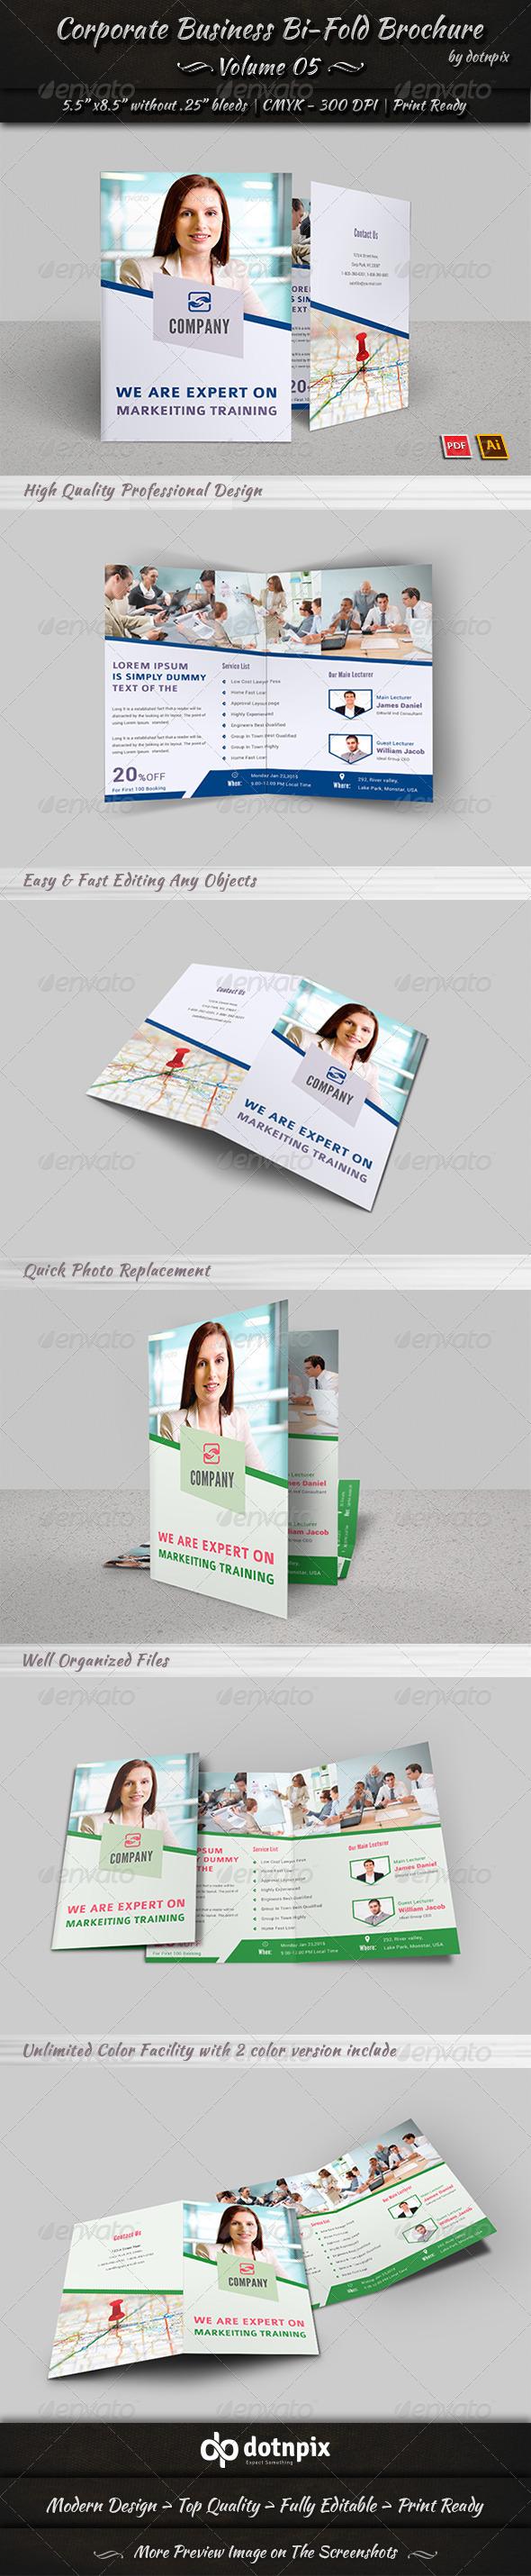 Corporate Business Bi-Fold Brochure Volume 5